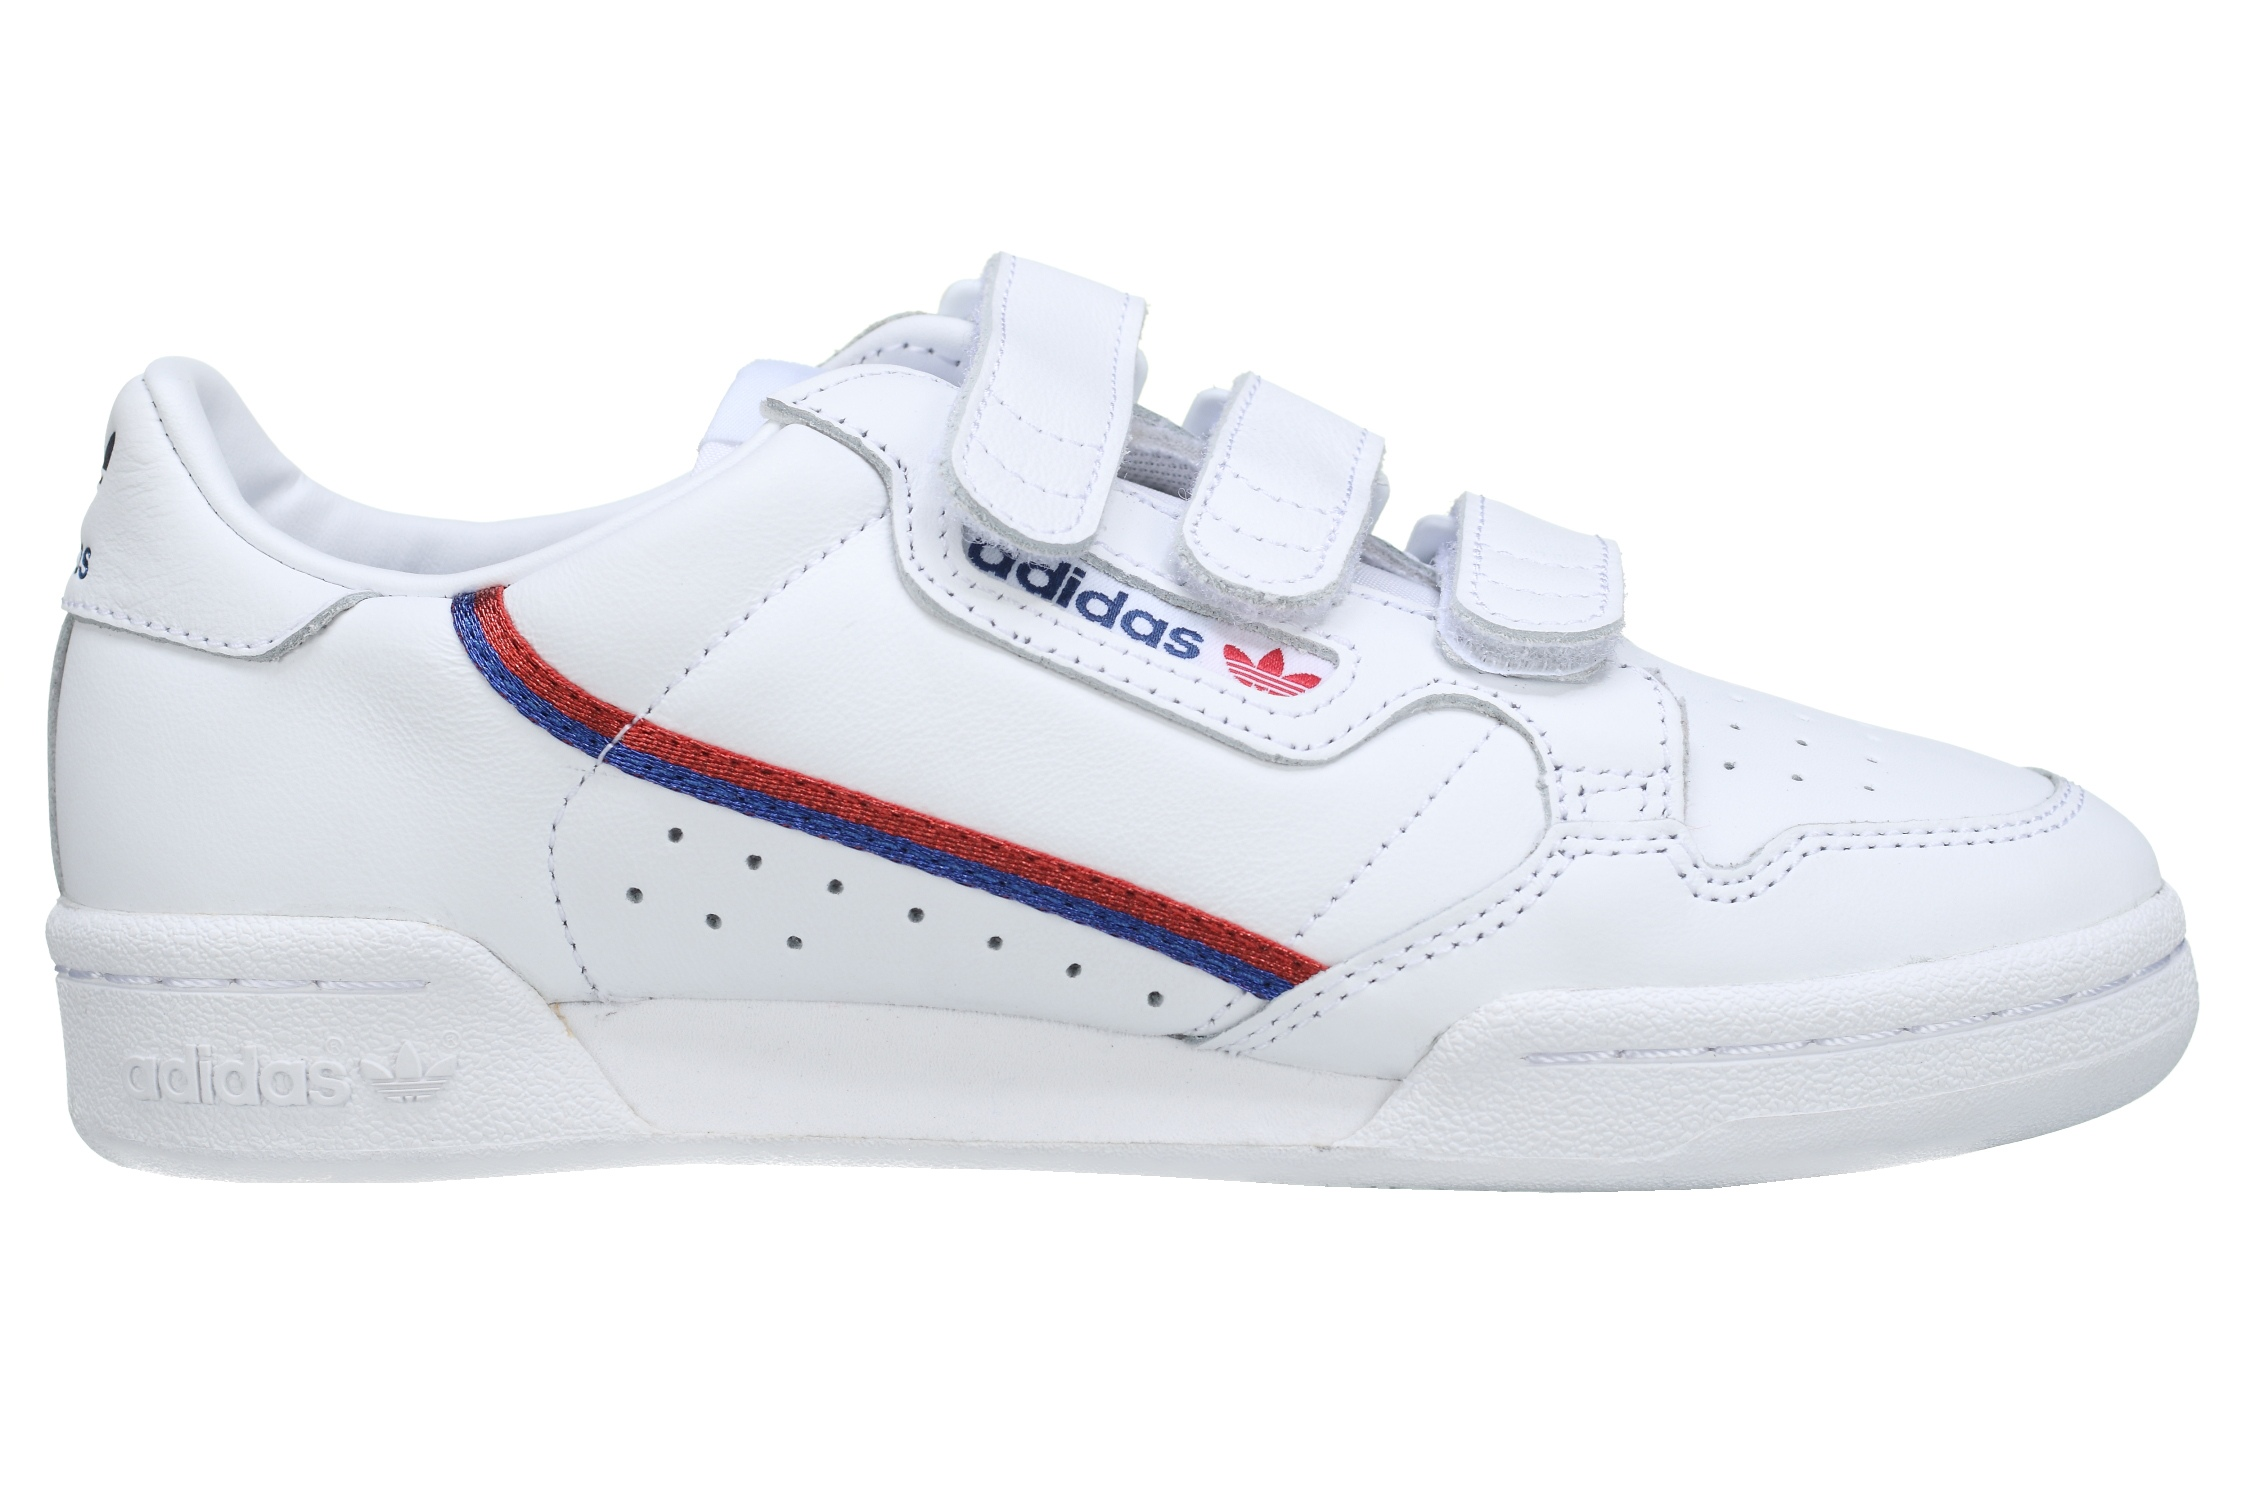 http://www.leadermode.com/184422/adidas-continental-80-w-st-ee5577-blanc.jpg